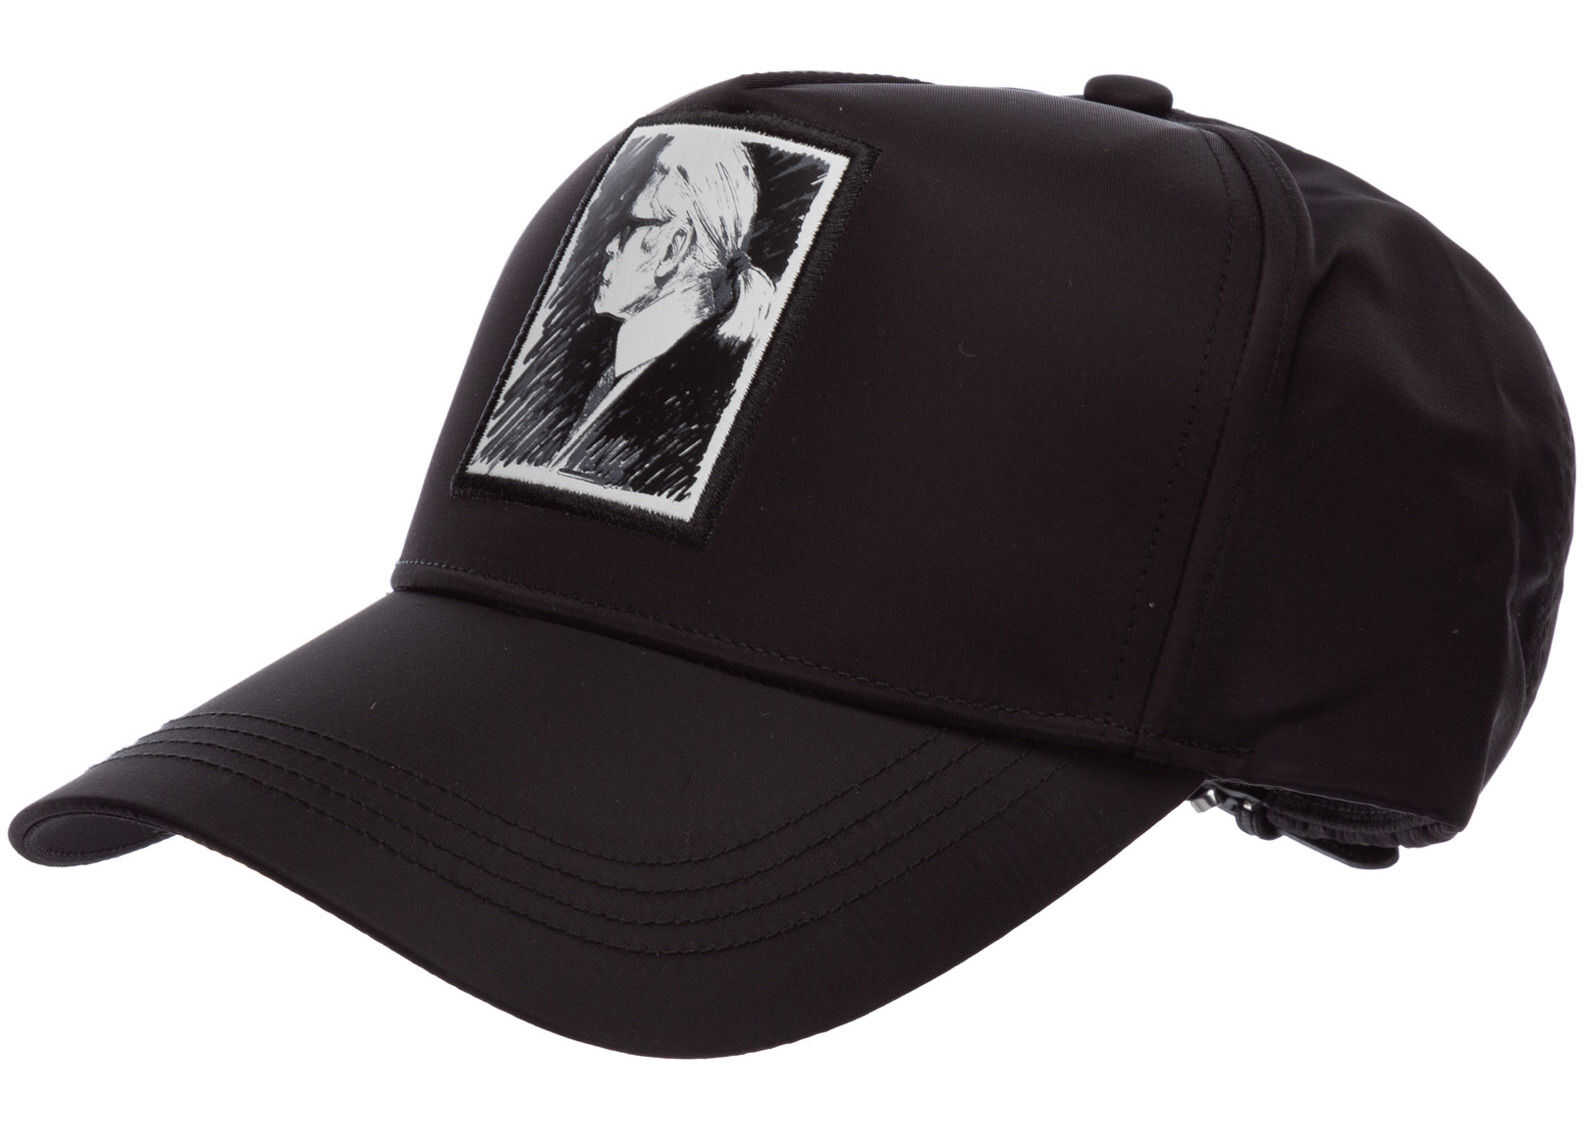 Karl Lagerfeld Karl Legend Black